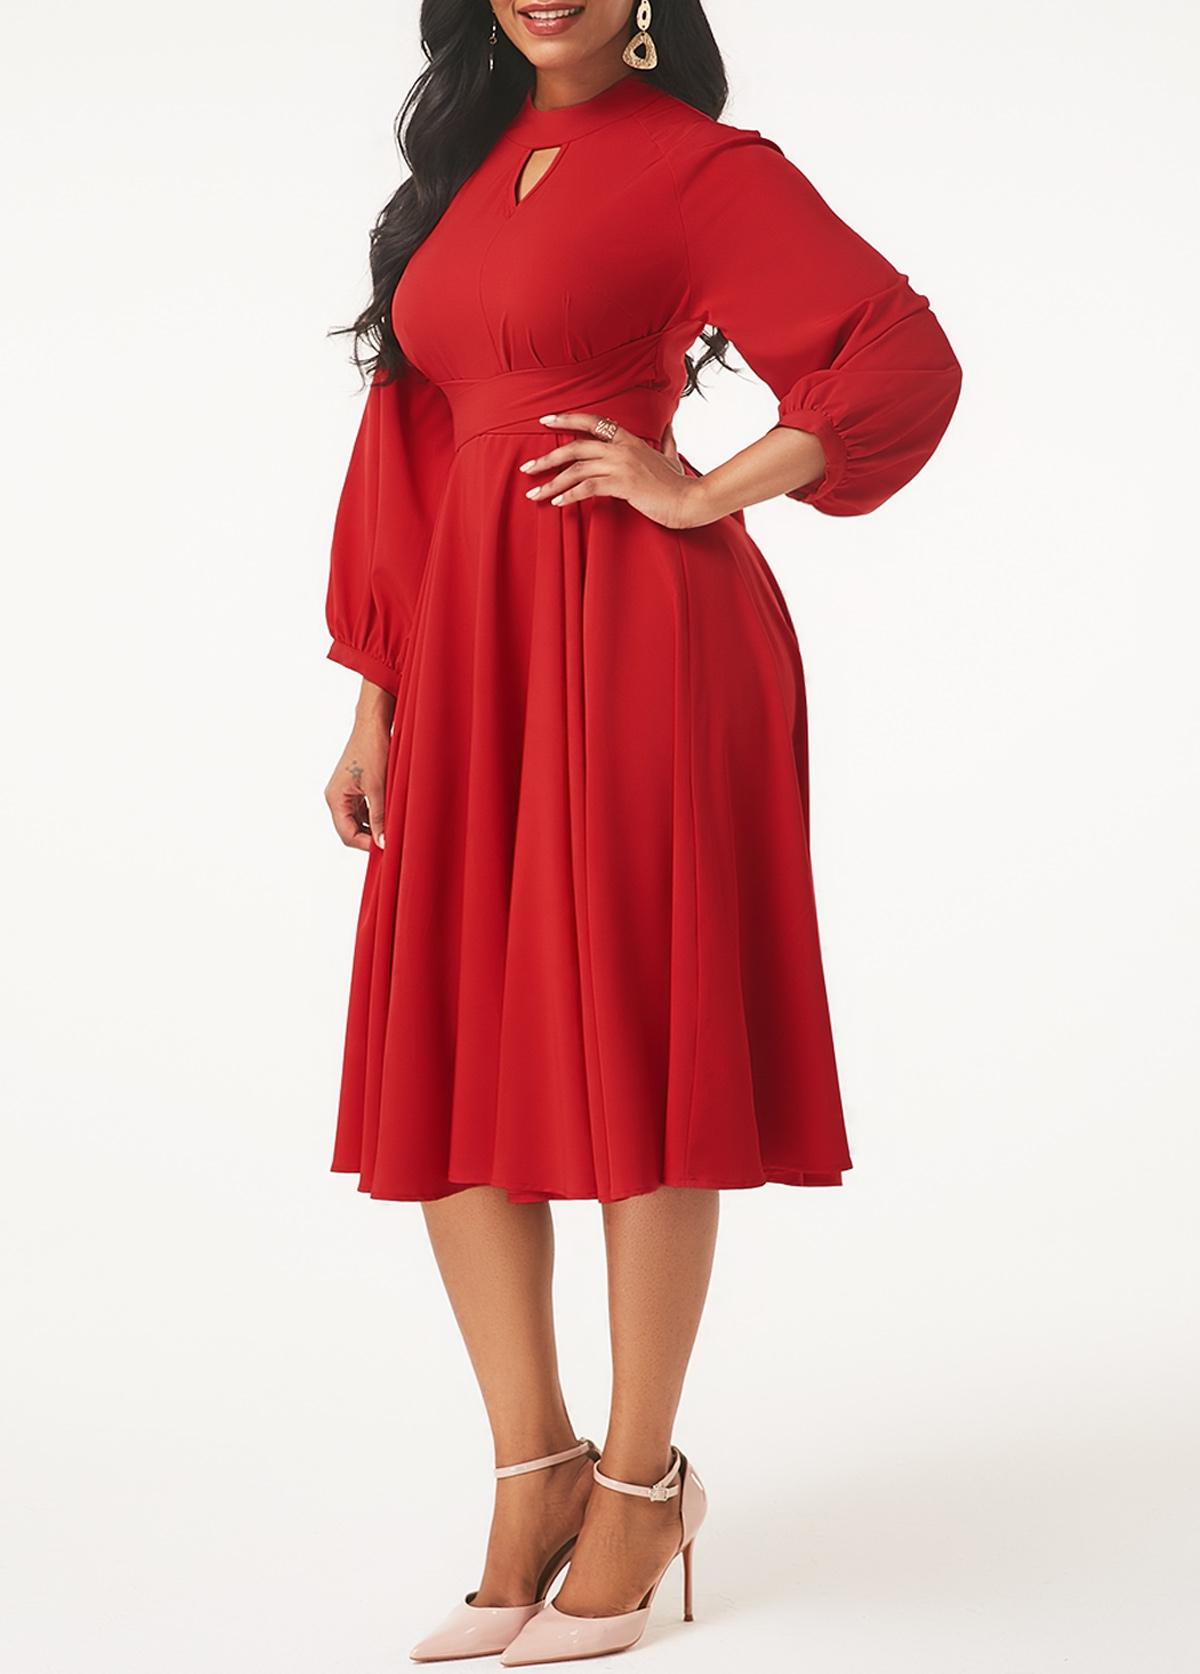 Red Lantern Sleeve Keyhole Neckline Dress